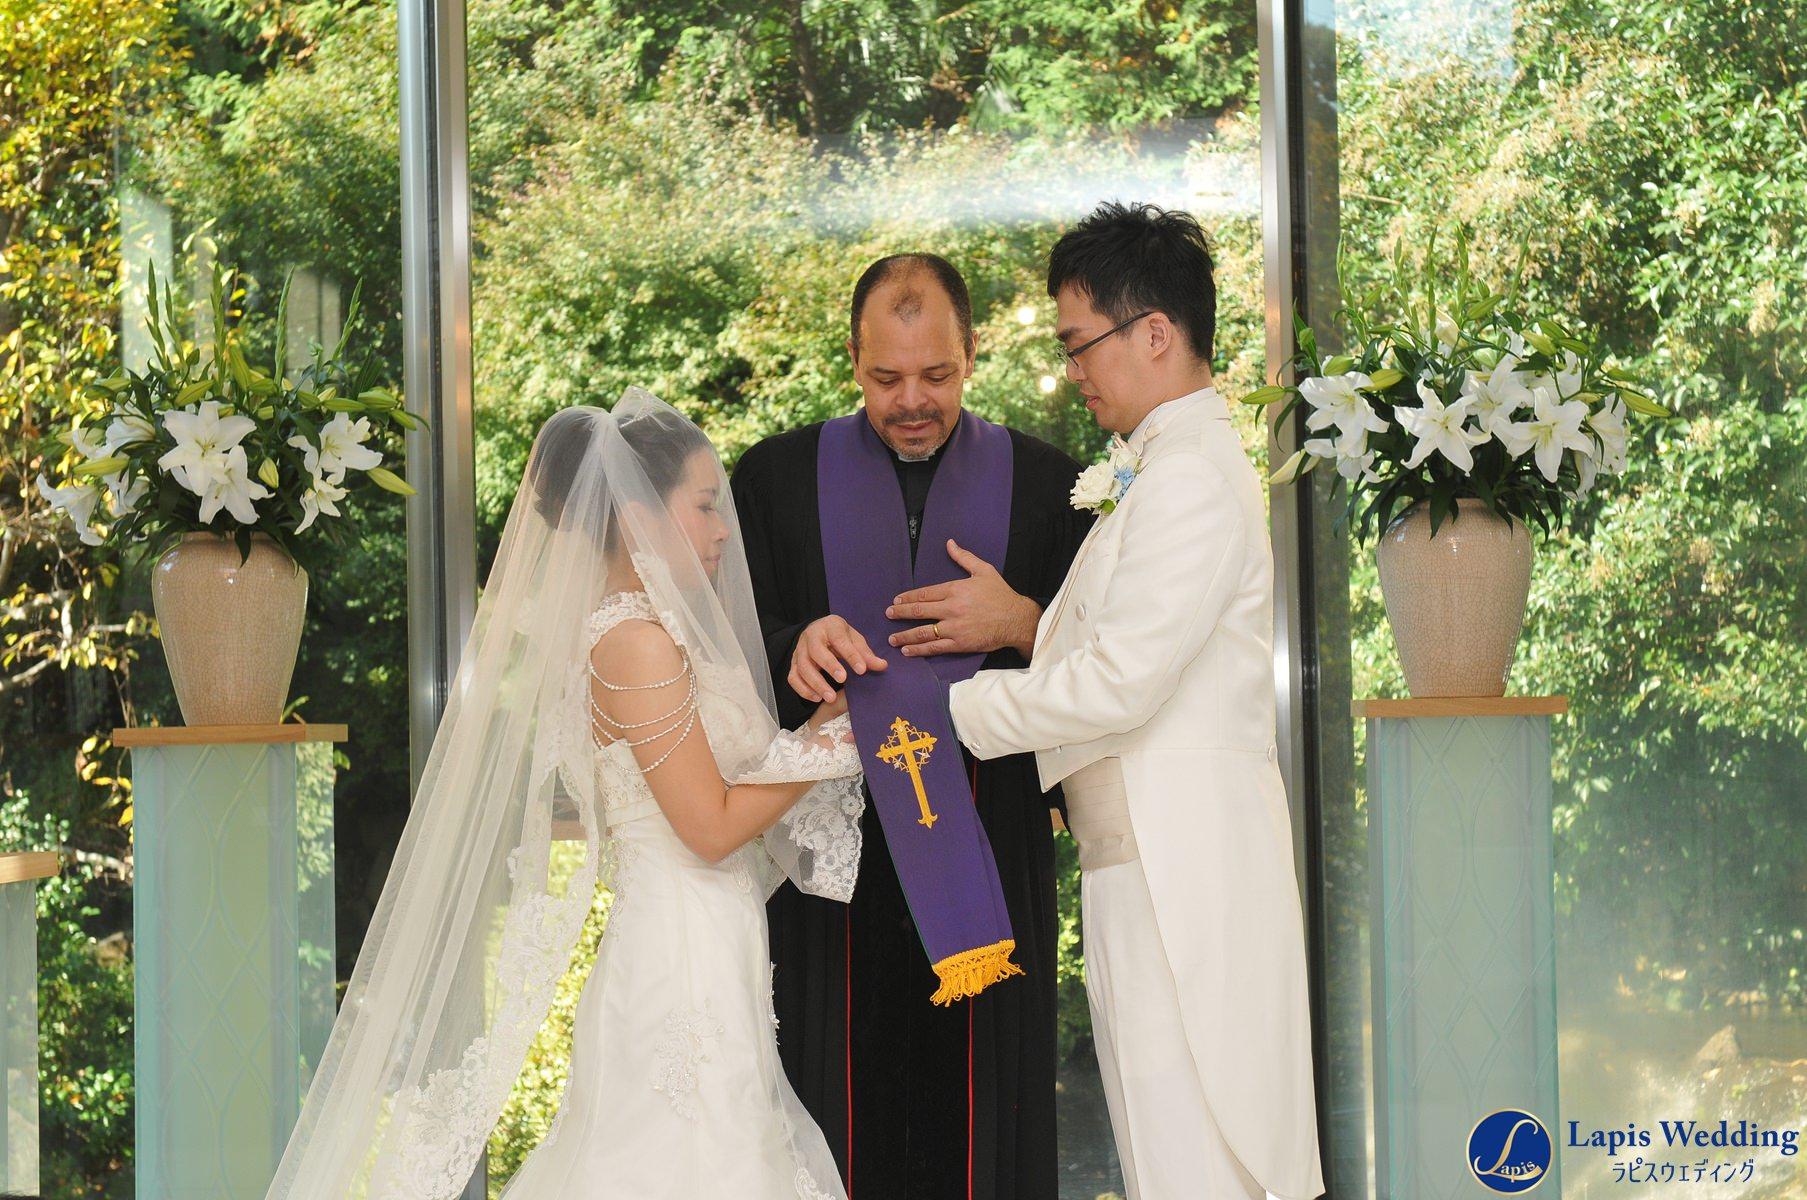 S+L 椿山莊水晶教堂婚禮紀錄